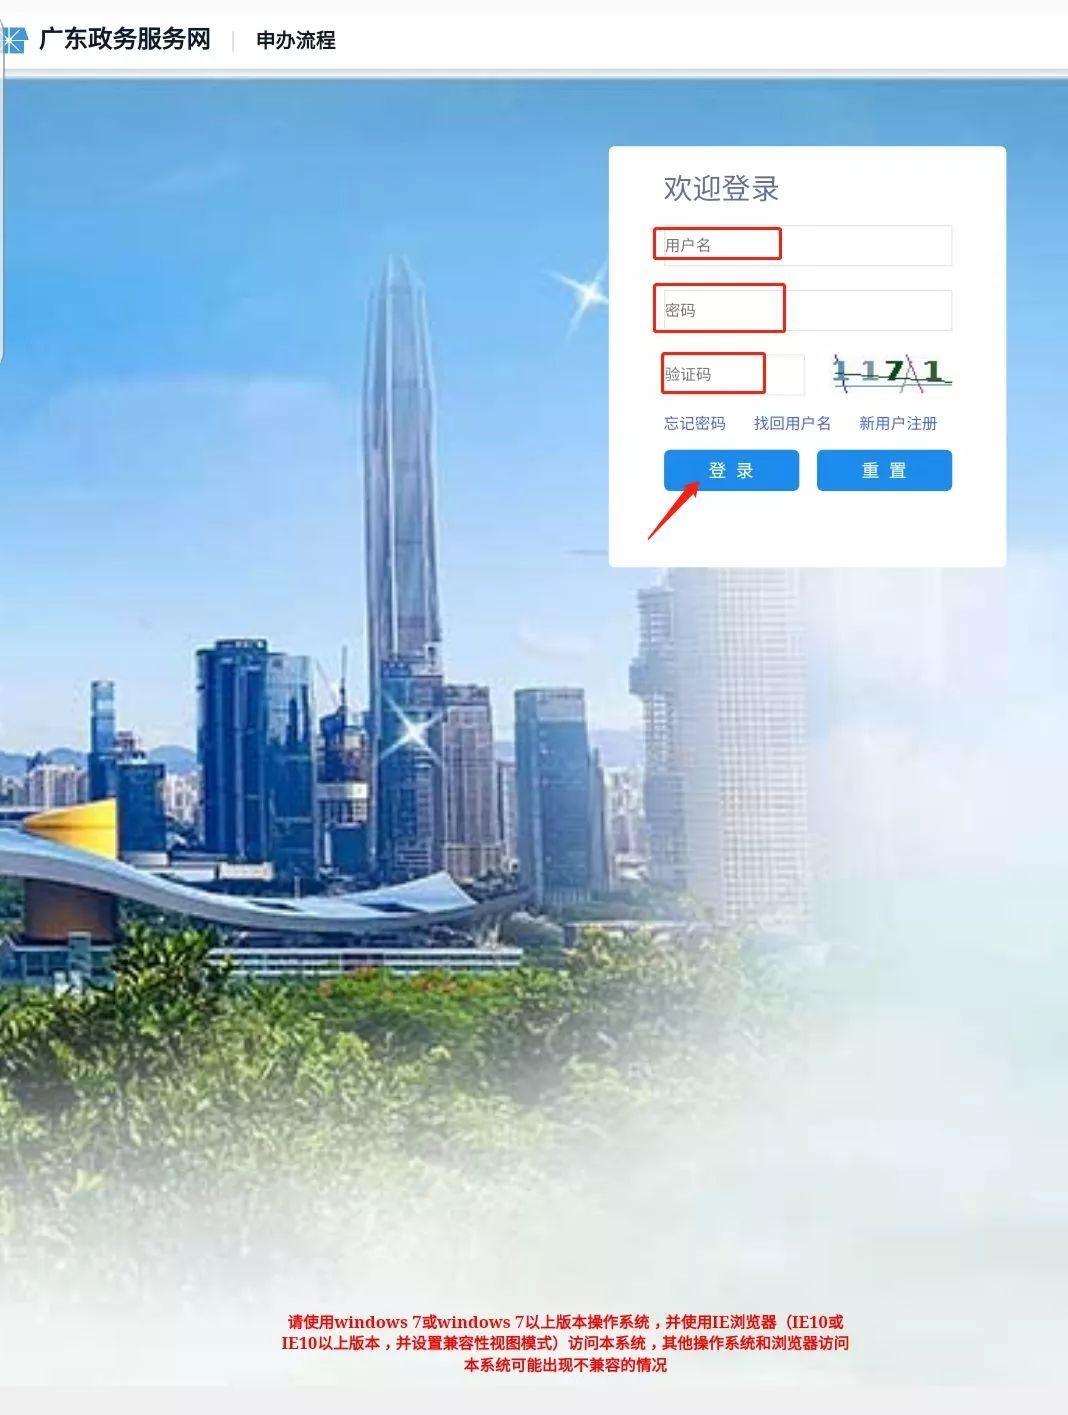 WWW_AHFC_GOV_CN_szsi.gov.cn/),点击个人网上服务系统链接.